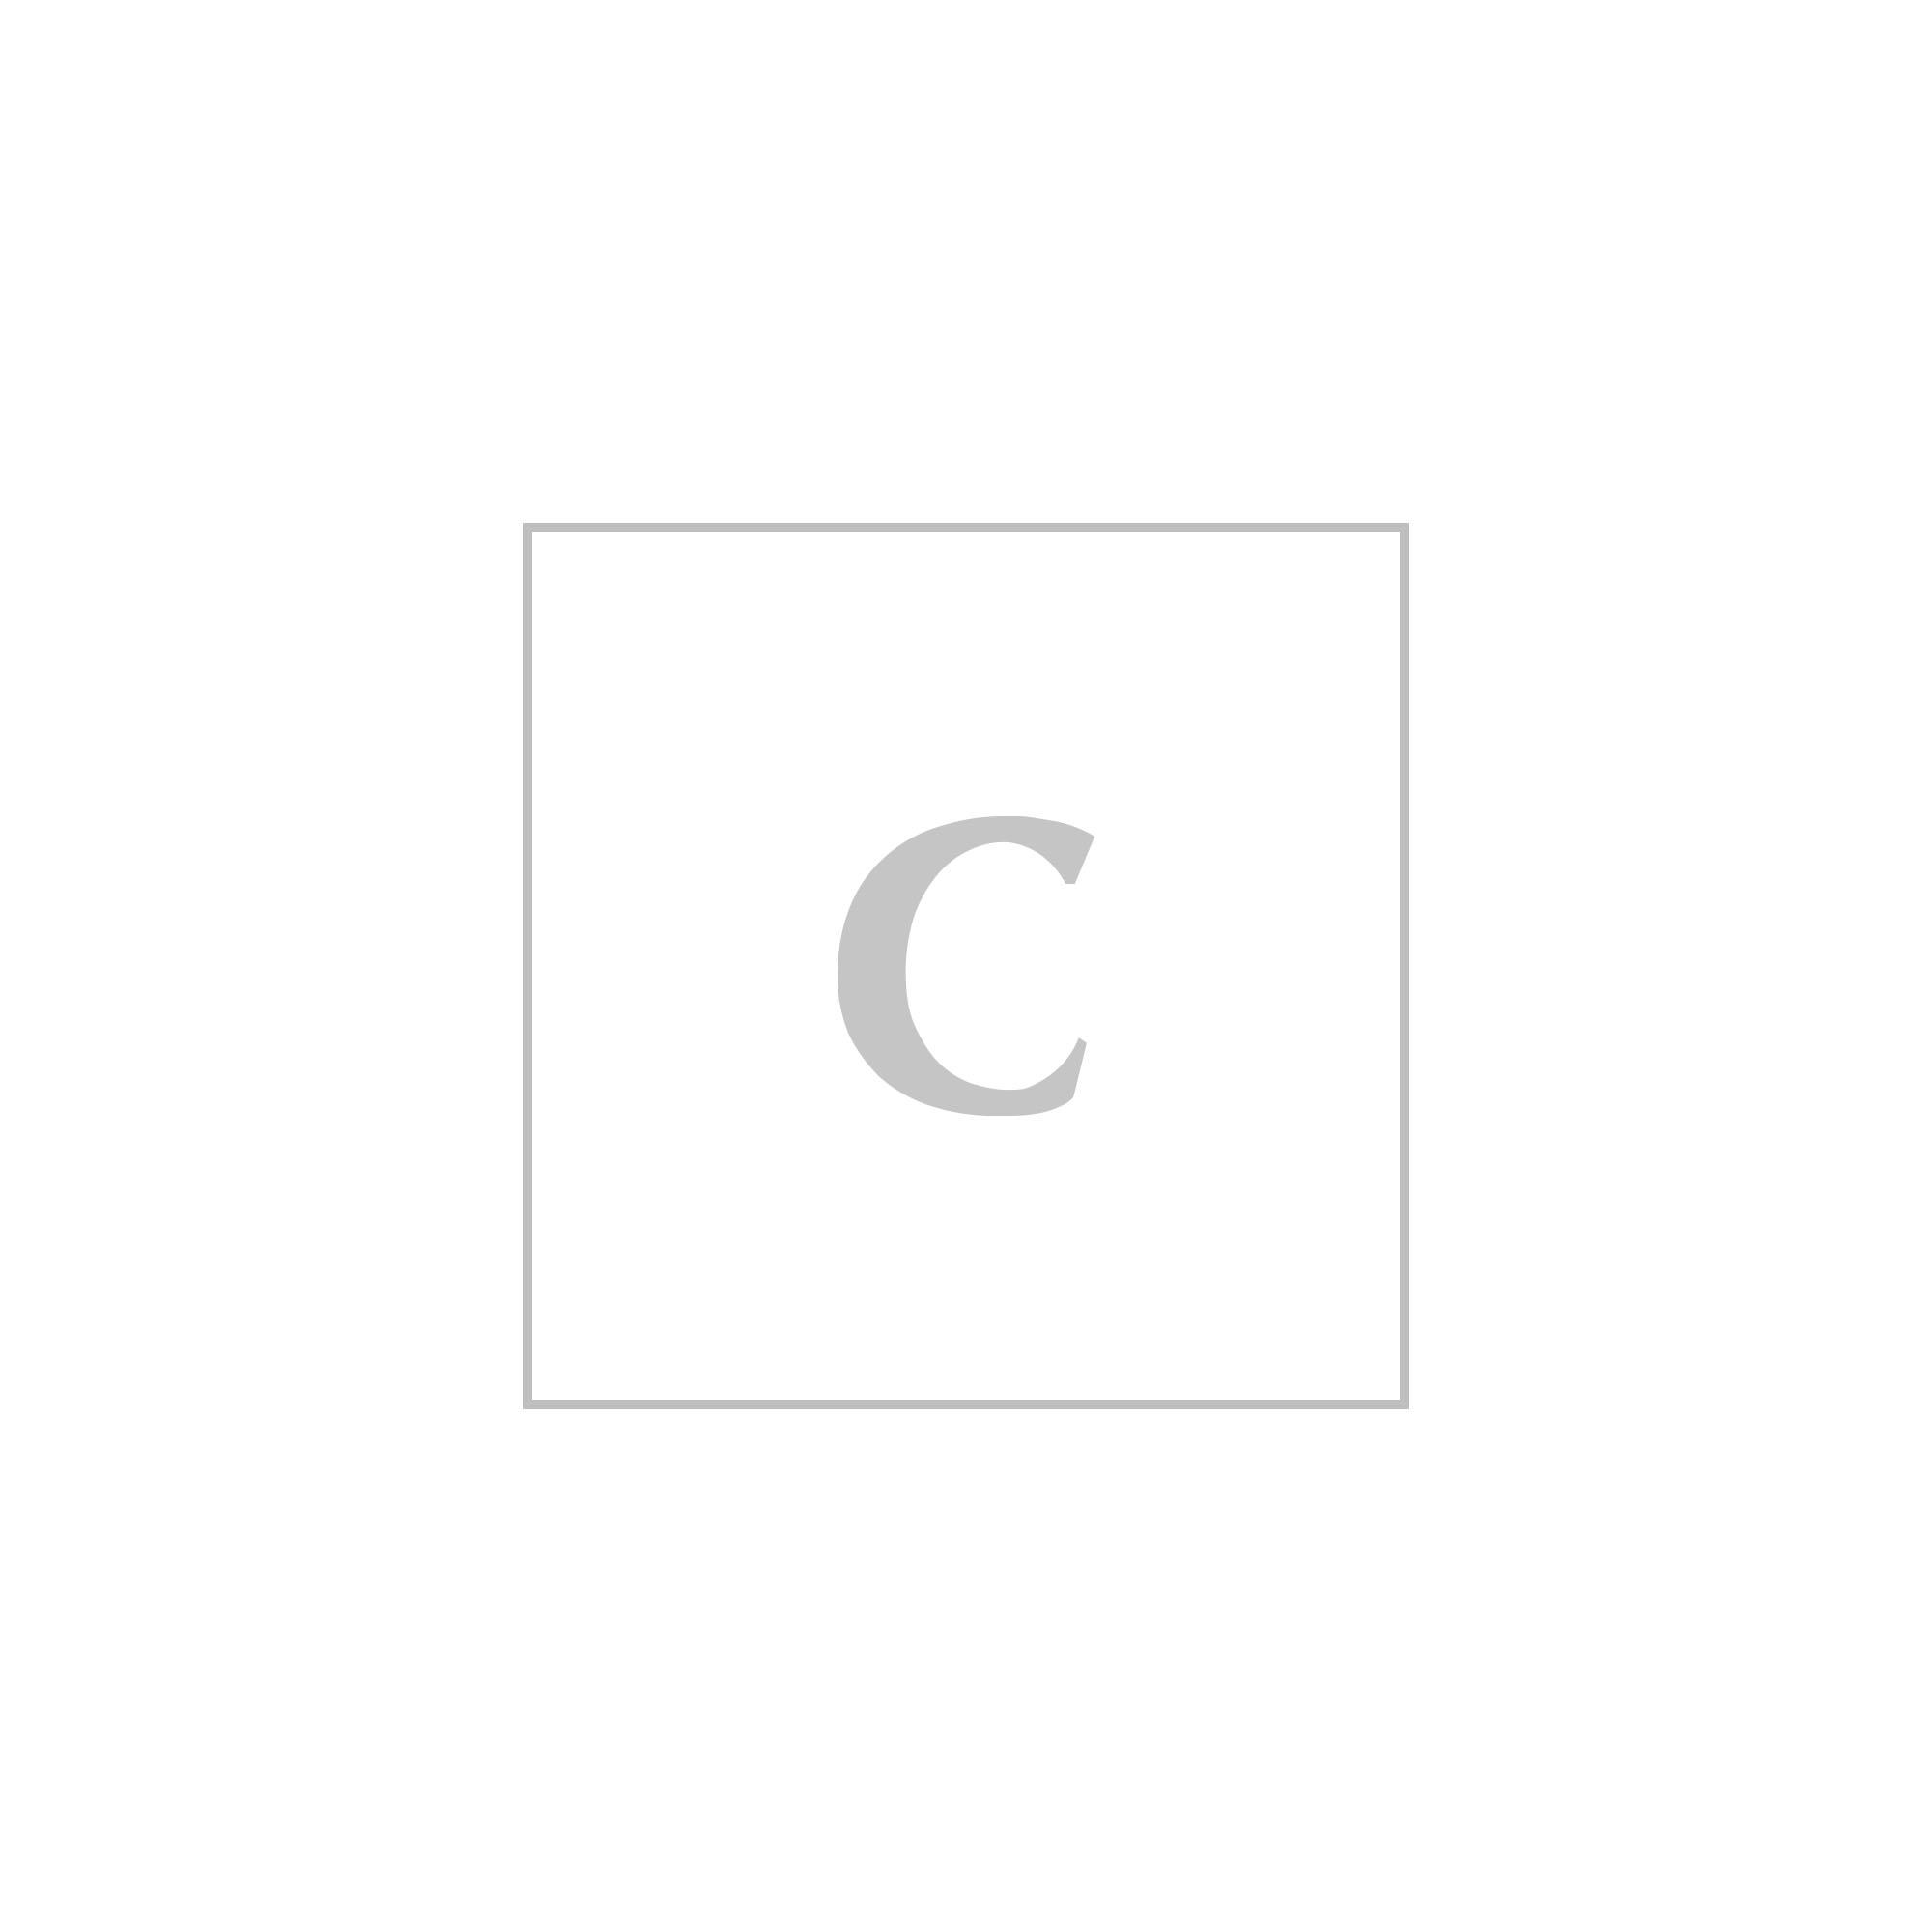 Moncler capsule giubbotto bettine